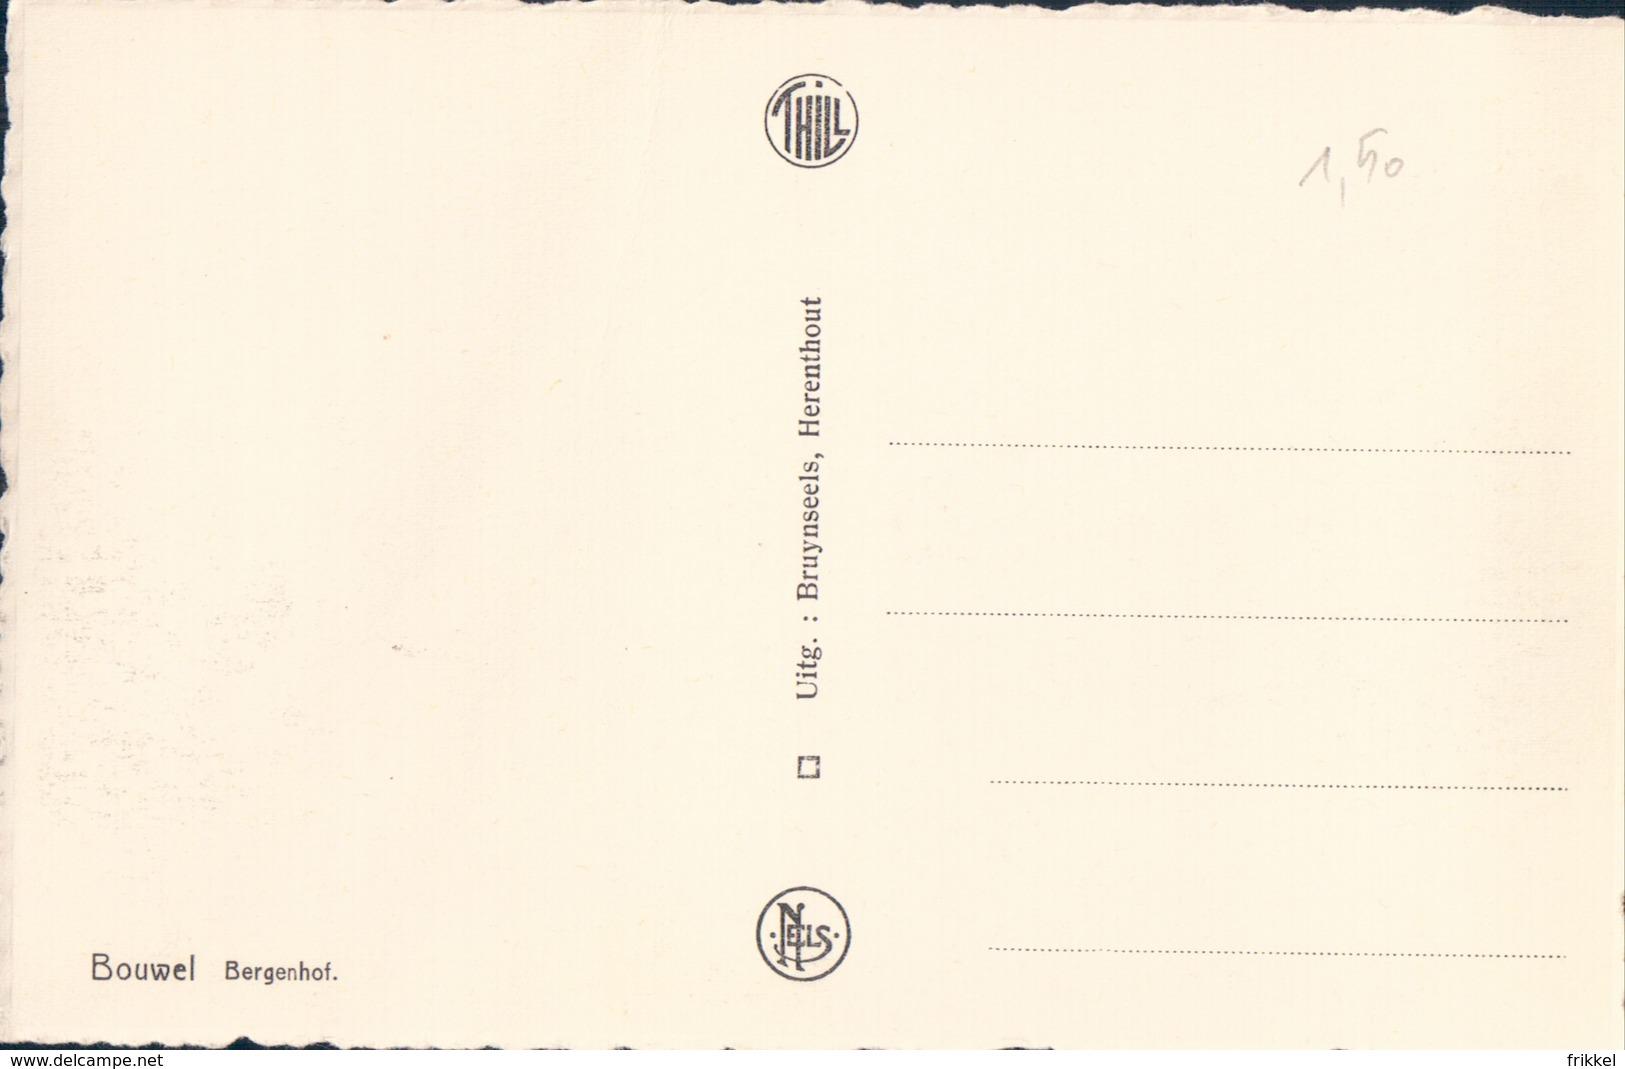 Bouwel Bergenhof - Herenthout